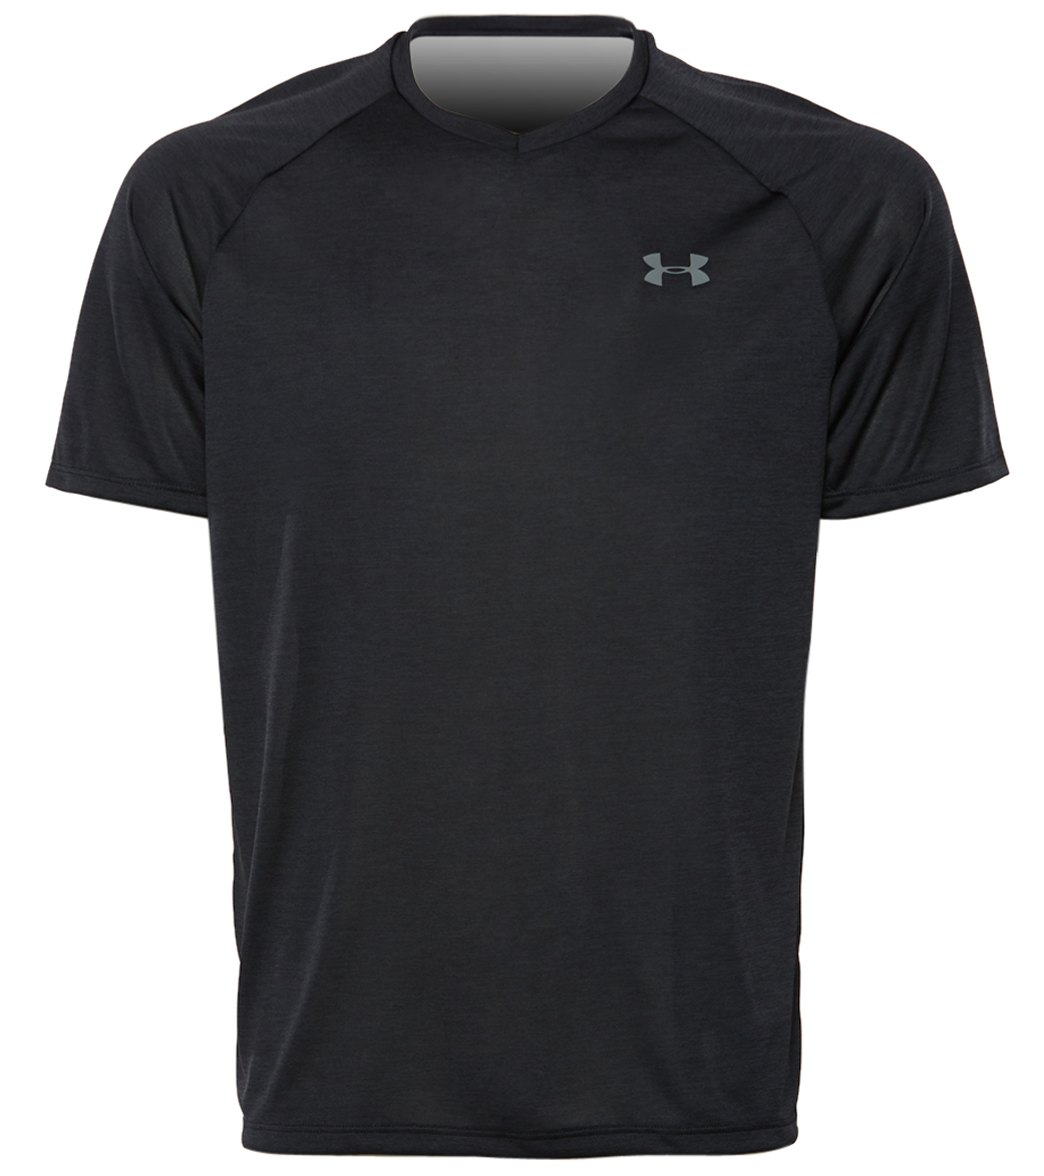 Men/'s Under Armour Heat Gear Loose Fit V-Neck T-Shirt